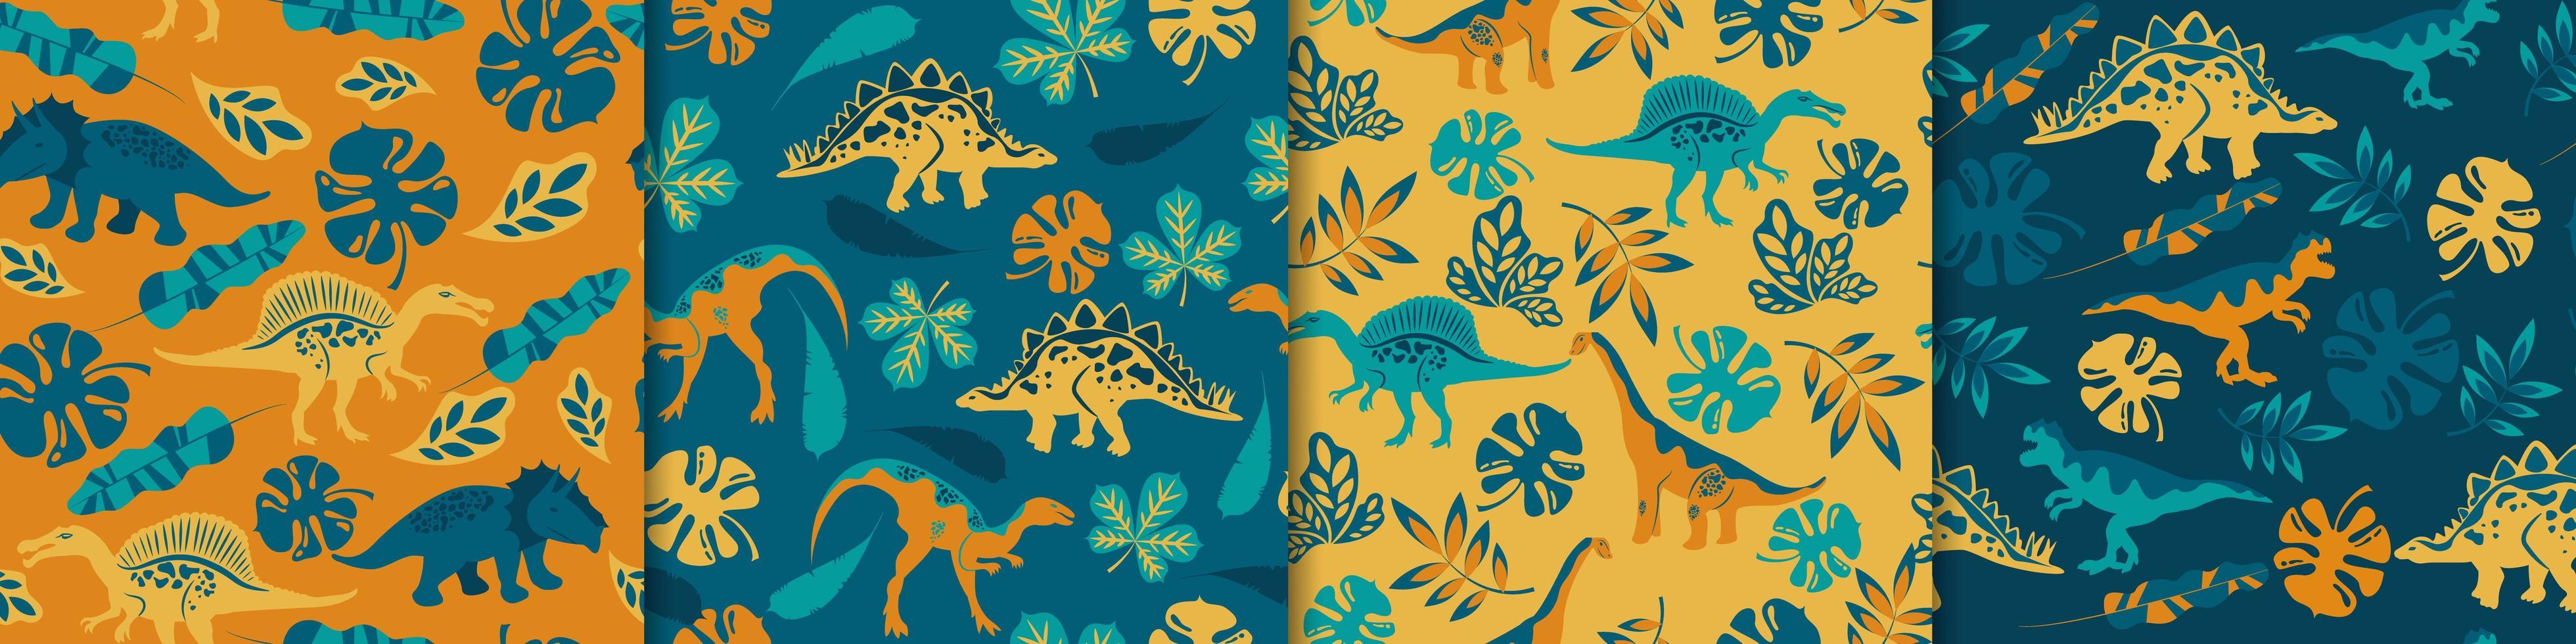 Dinosaurs seamless patterns vector